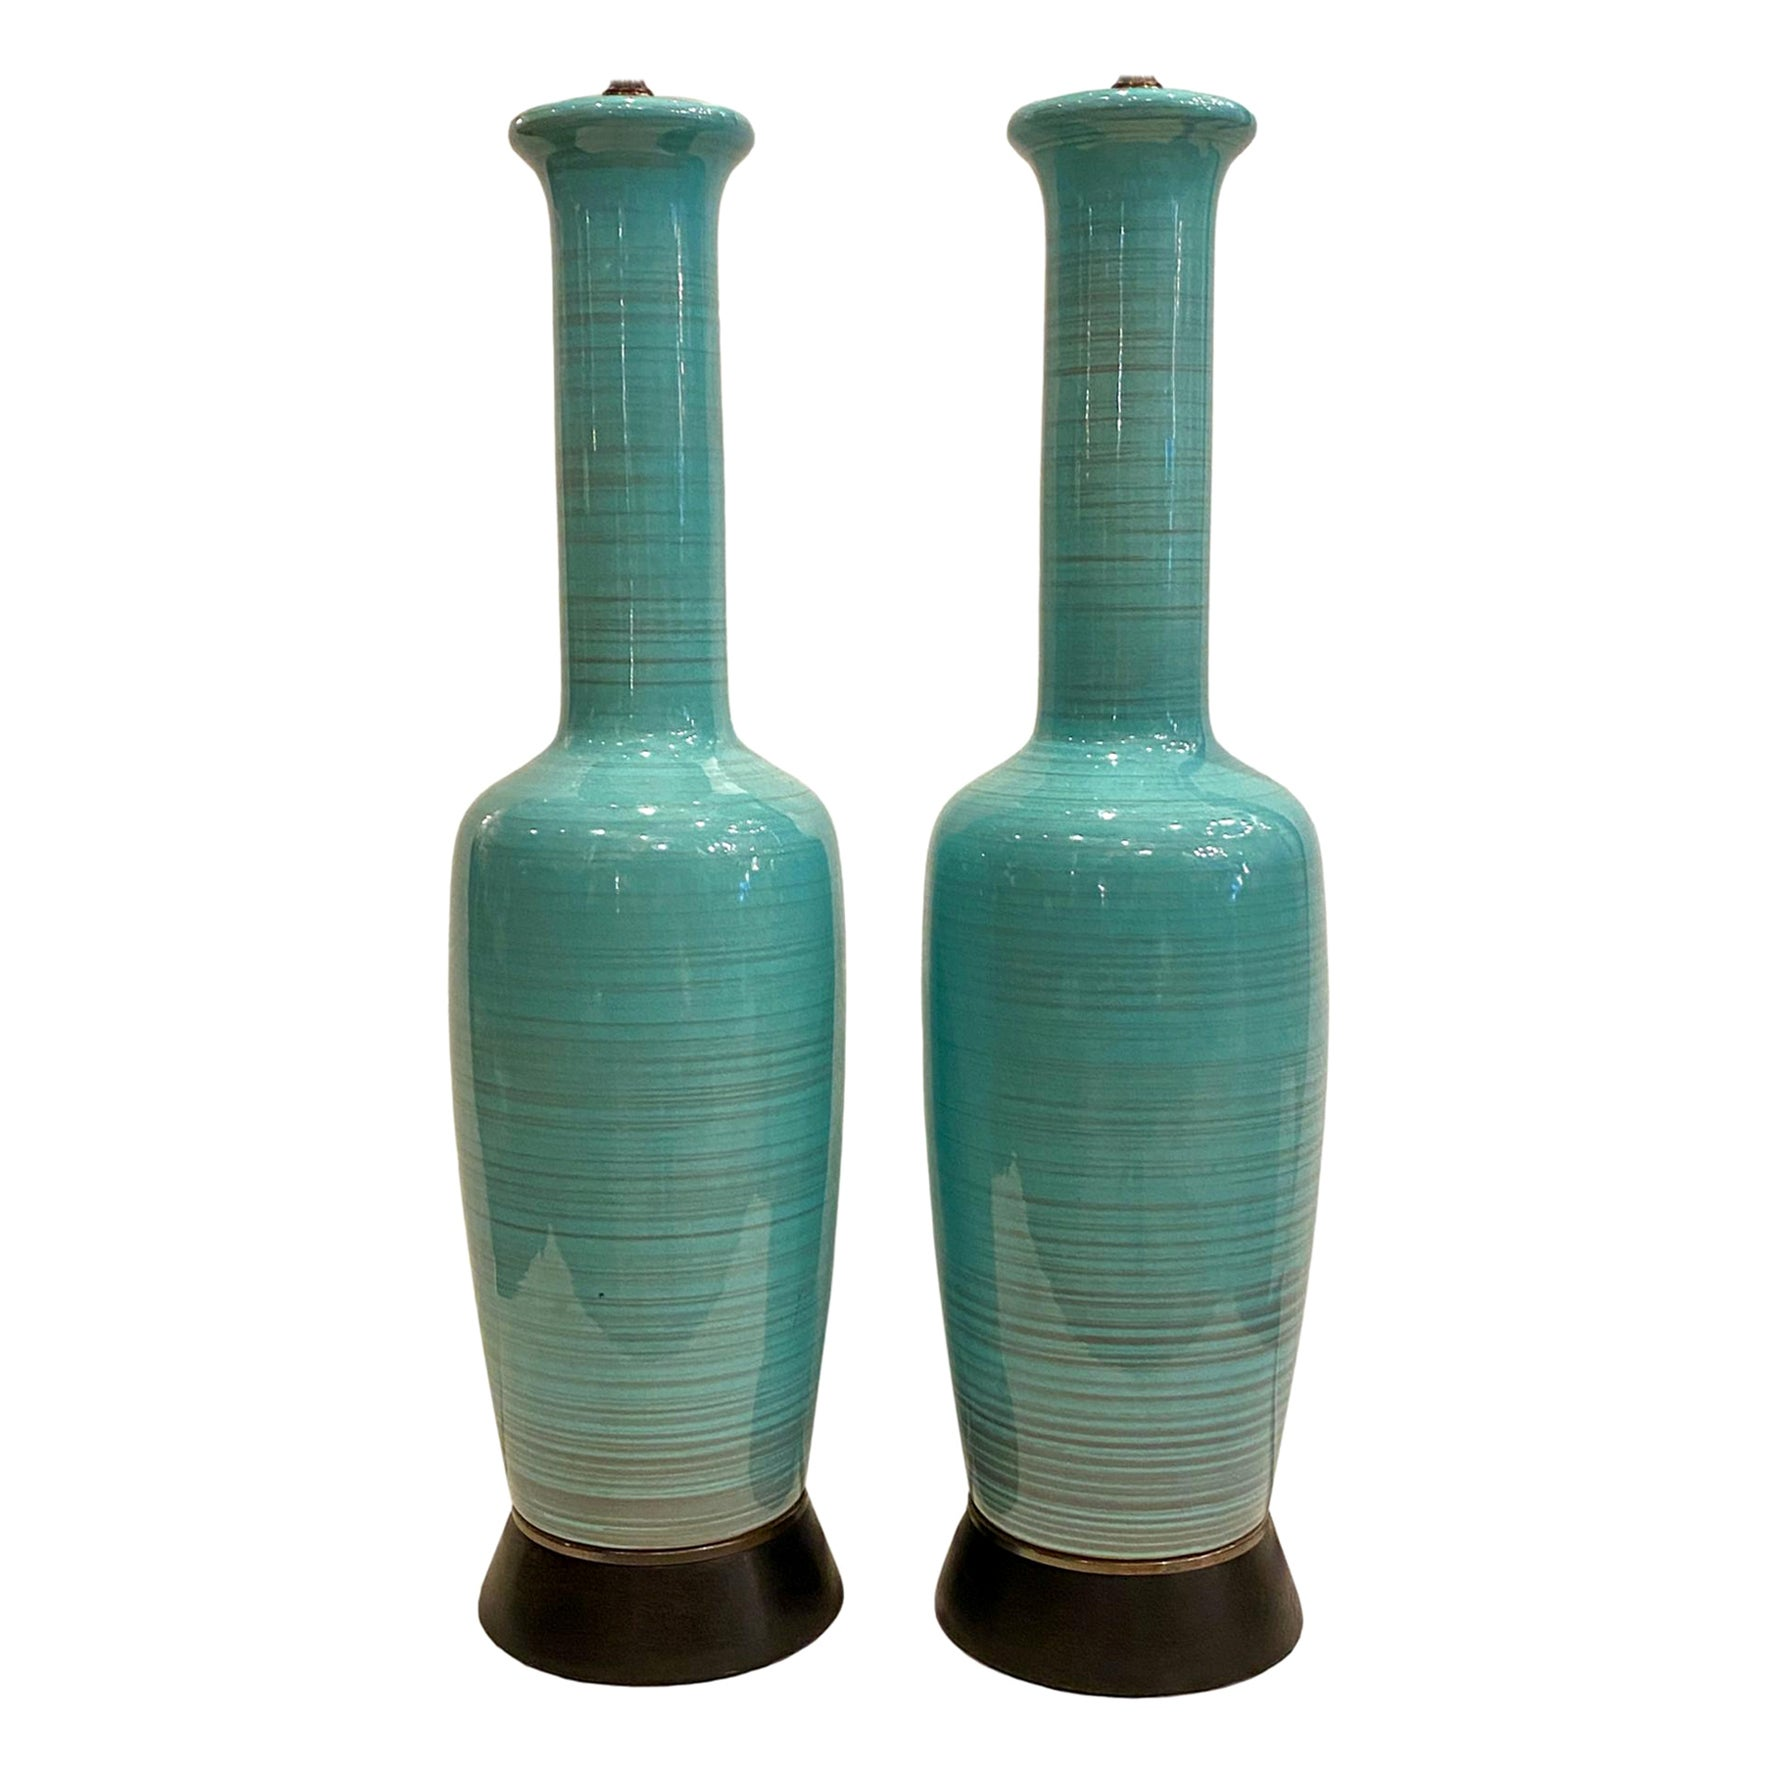 Pair of Midcentury Blue Porcelain Lamps